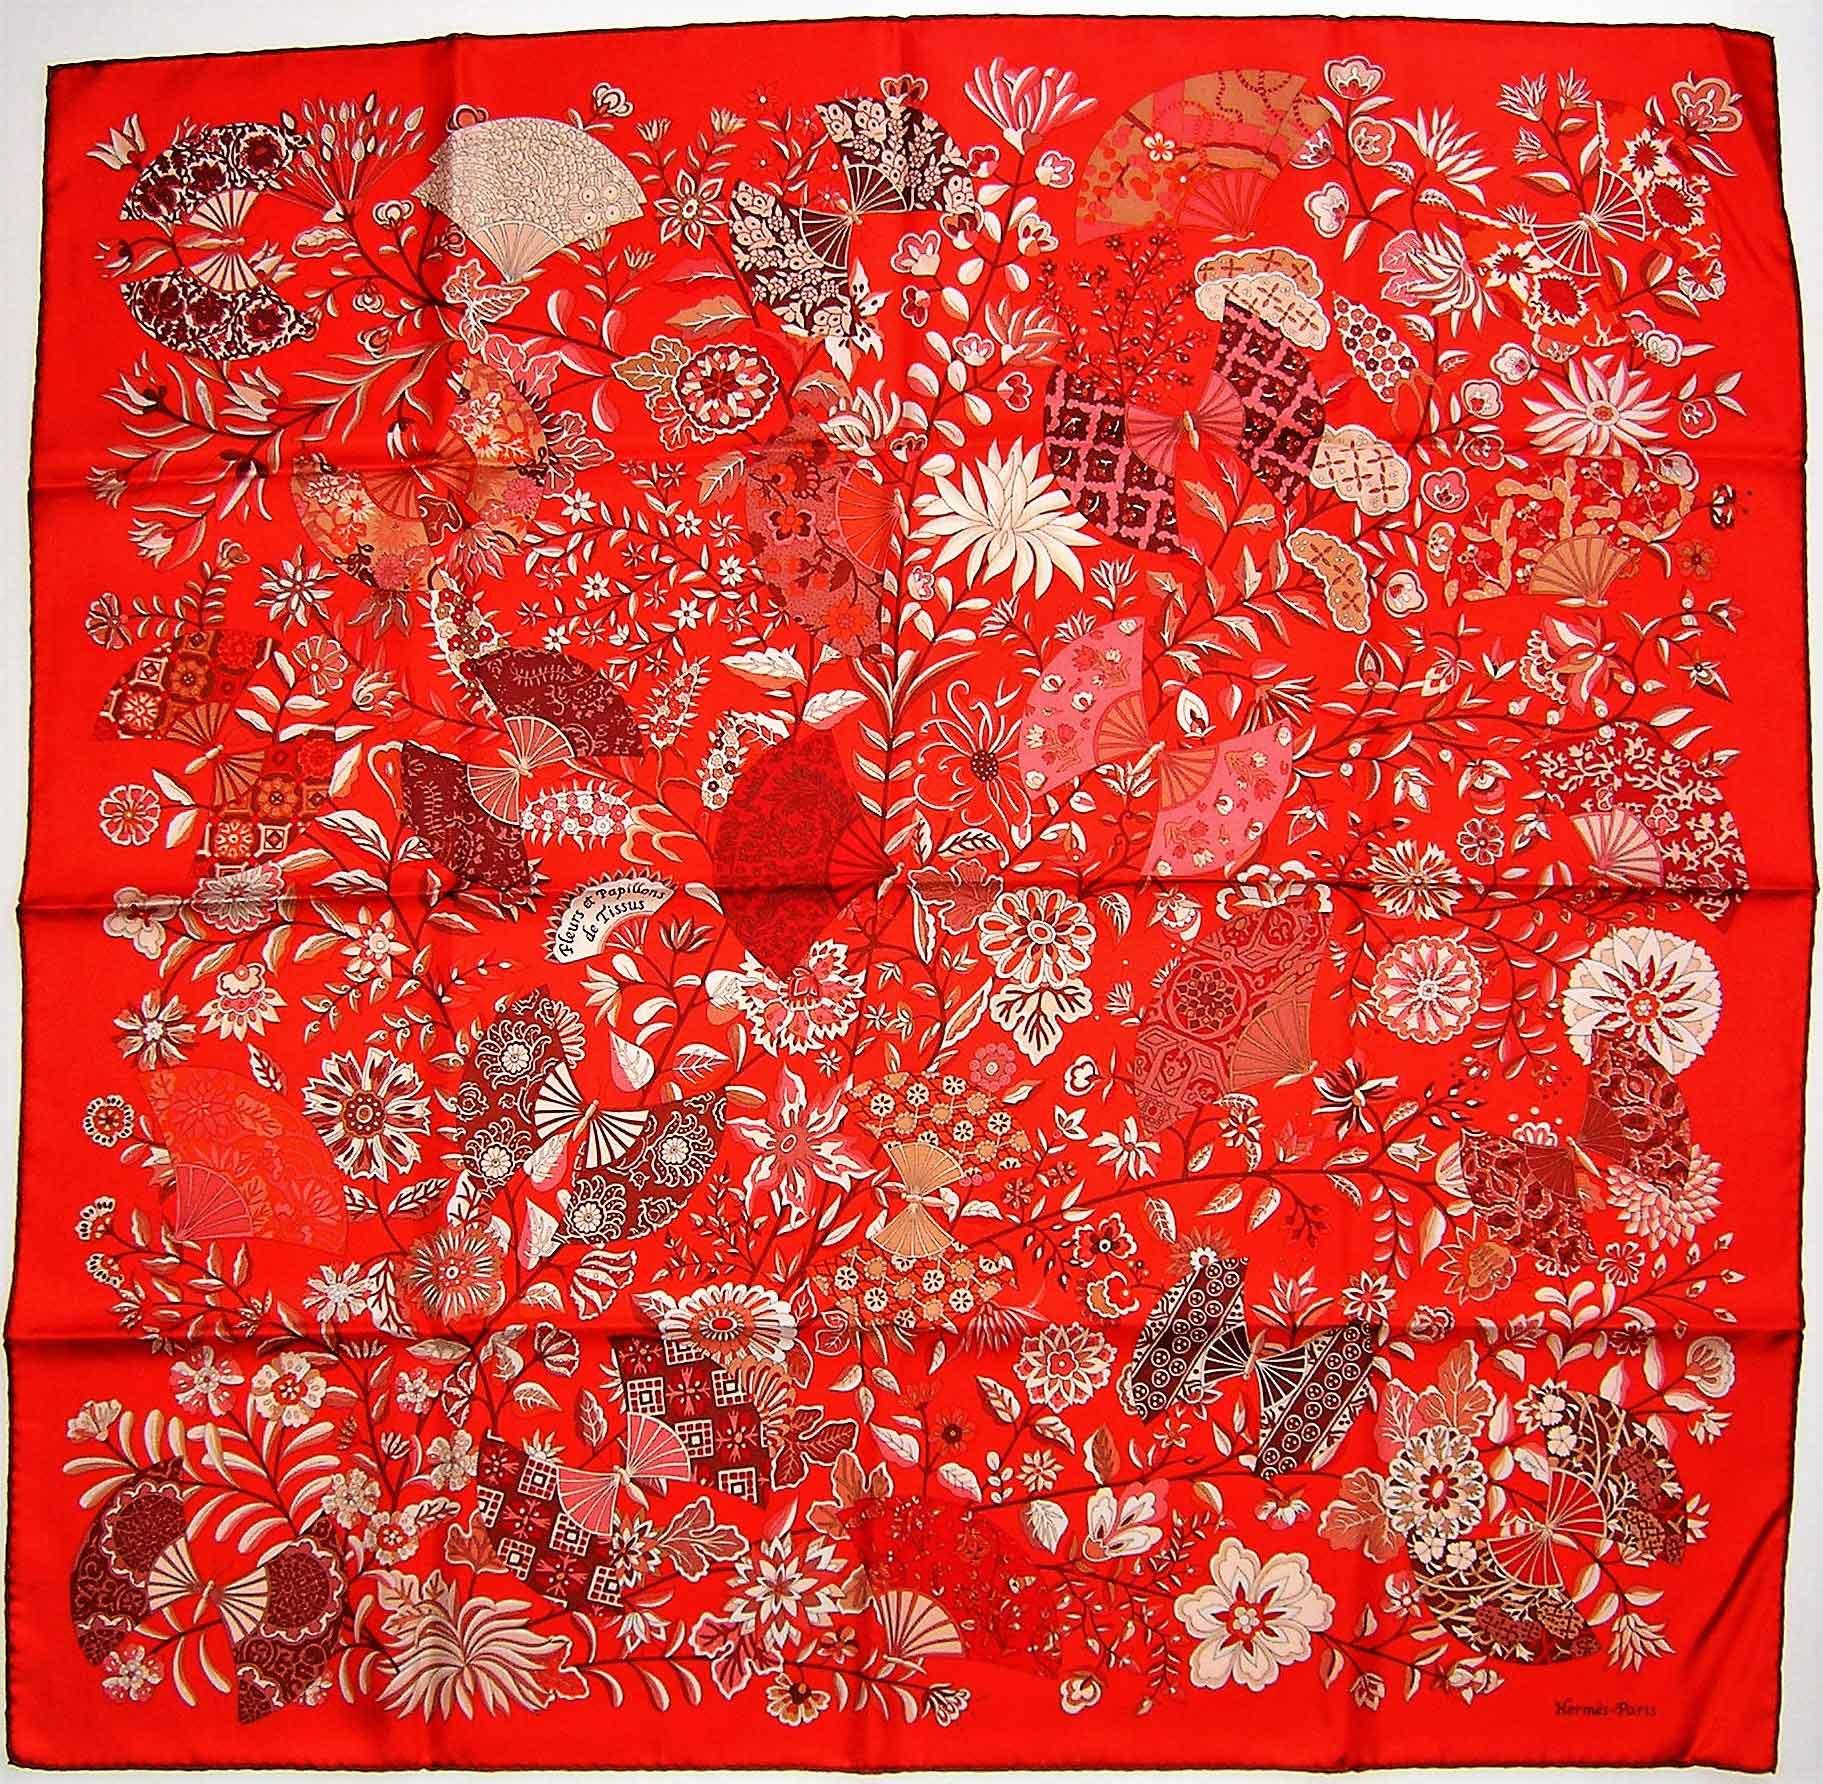 fleurs et papillons de tissus hermes scarf it 39 s all goode. Black Bedroom Furniture Sets. Home Design Ideas